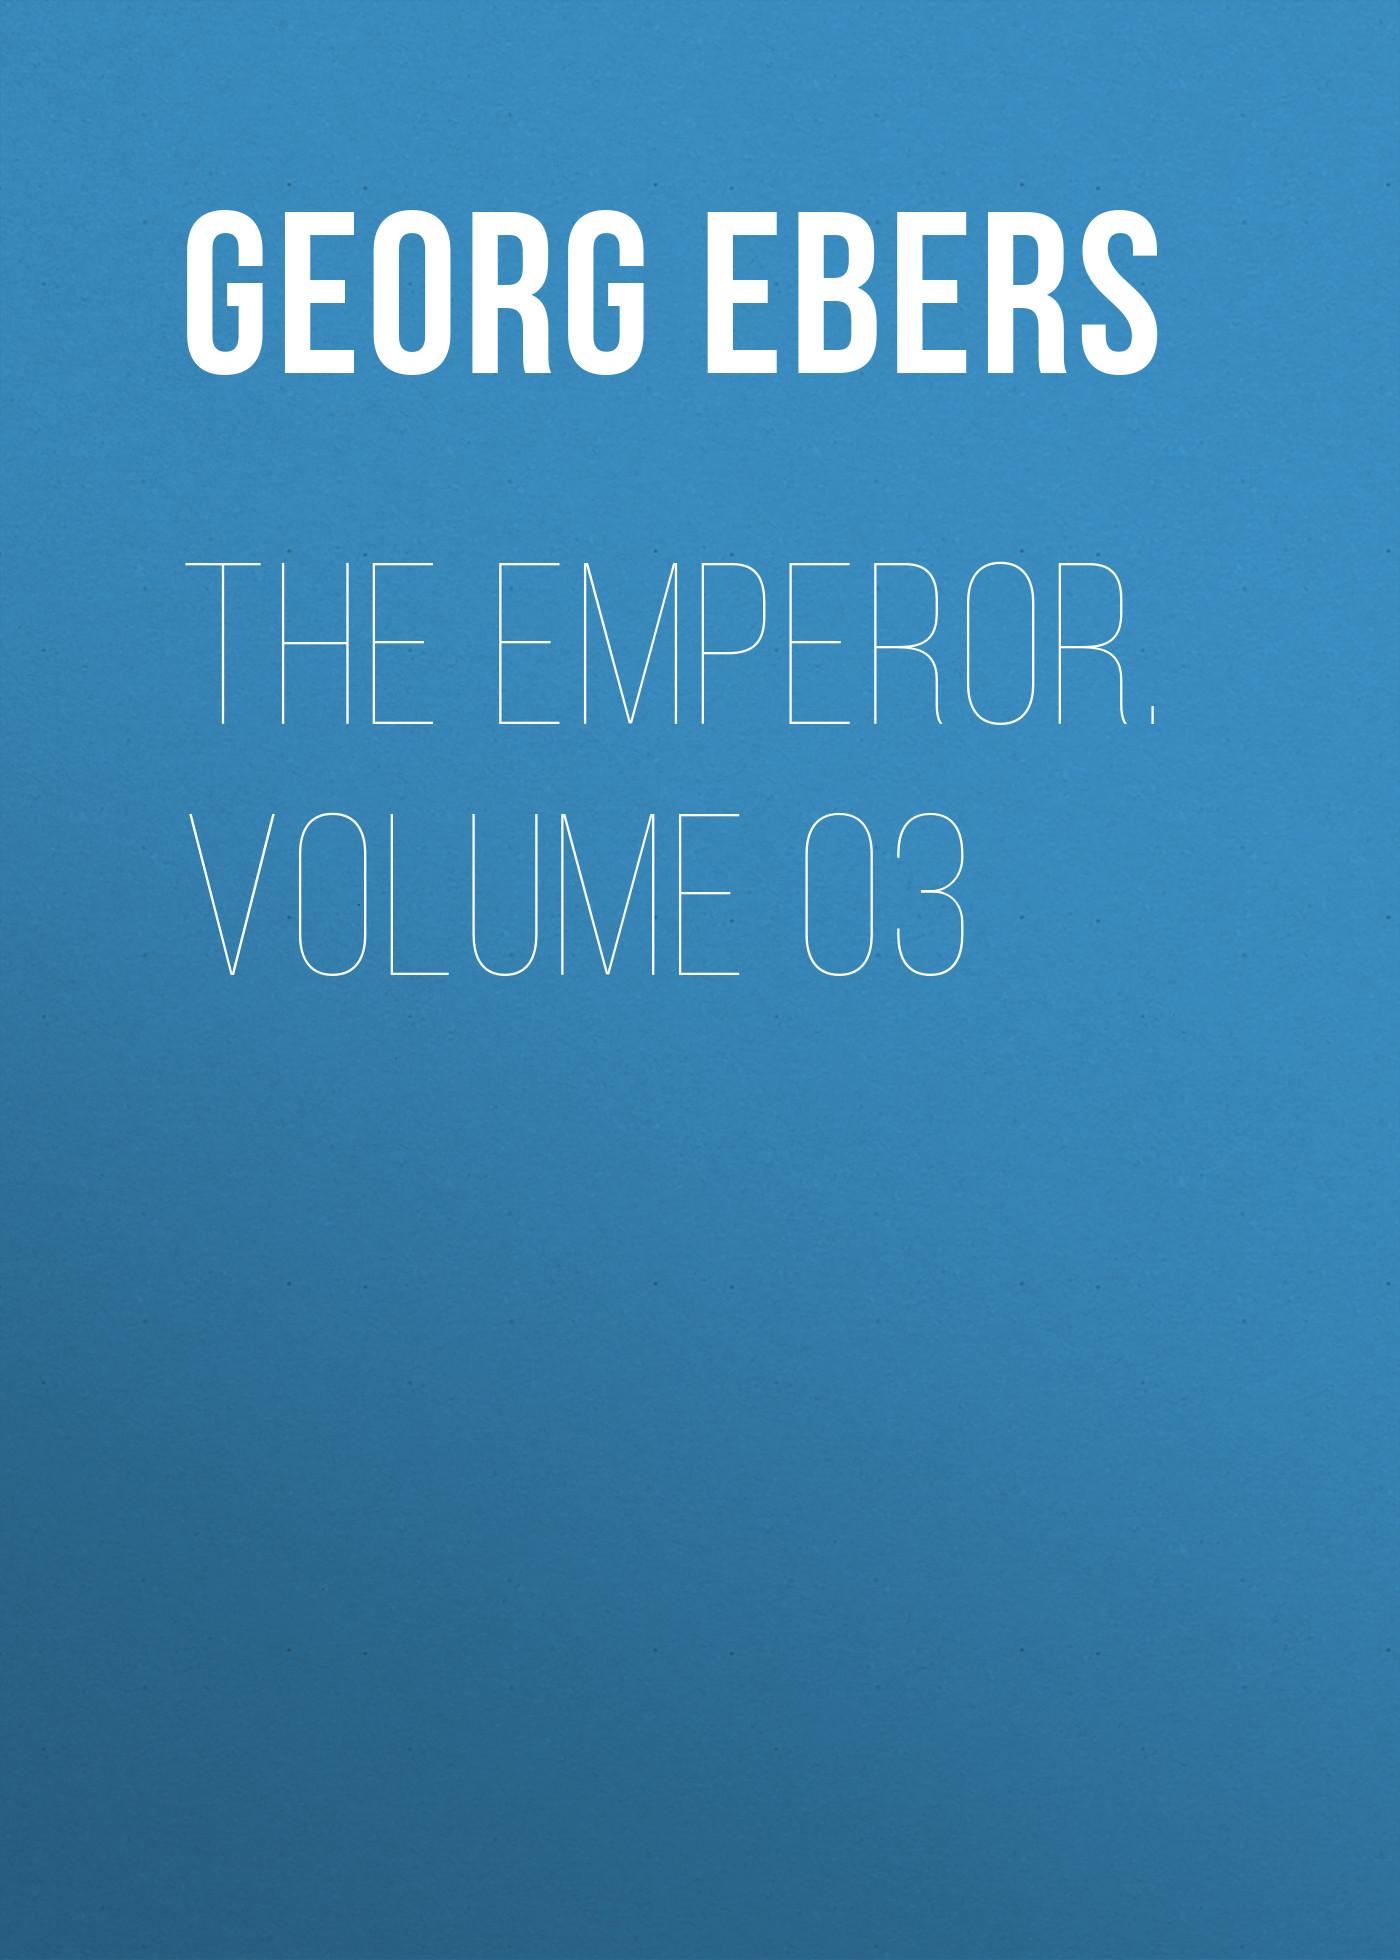 Georg Ebers The Emperor. Volume 03 georg ebers homo sum volume 02